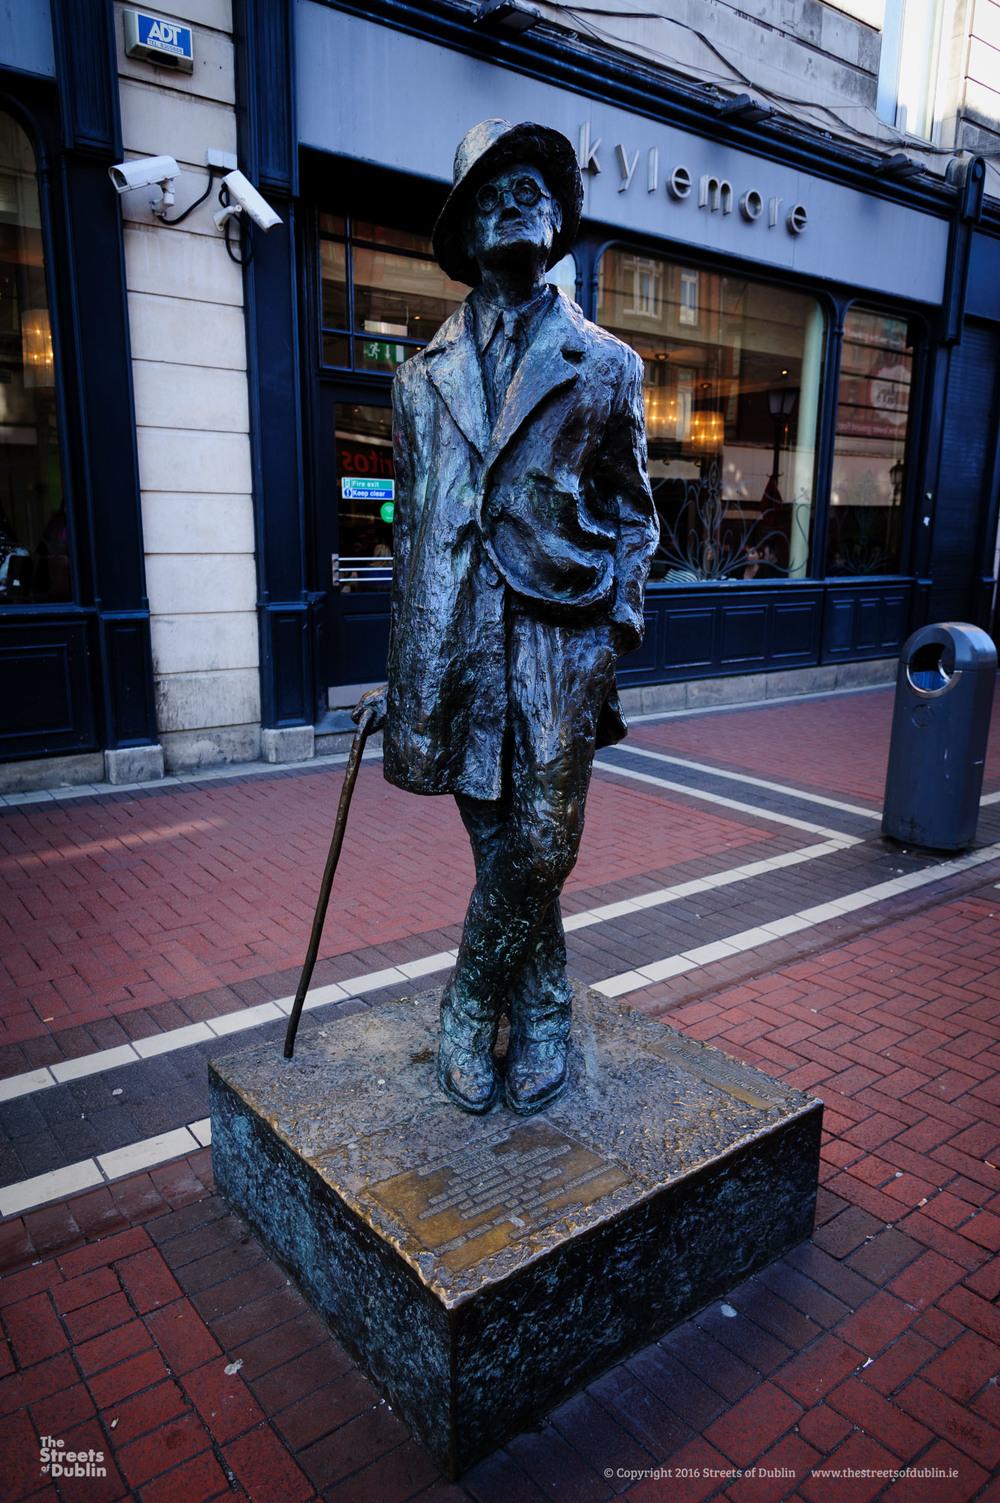 Streets-of-Dublin-Photo-1545.jpg